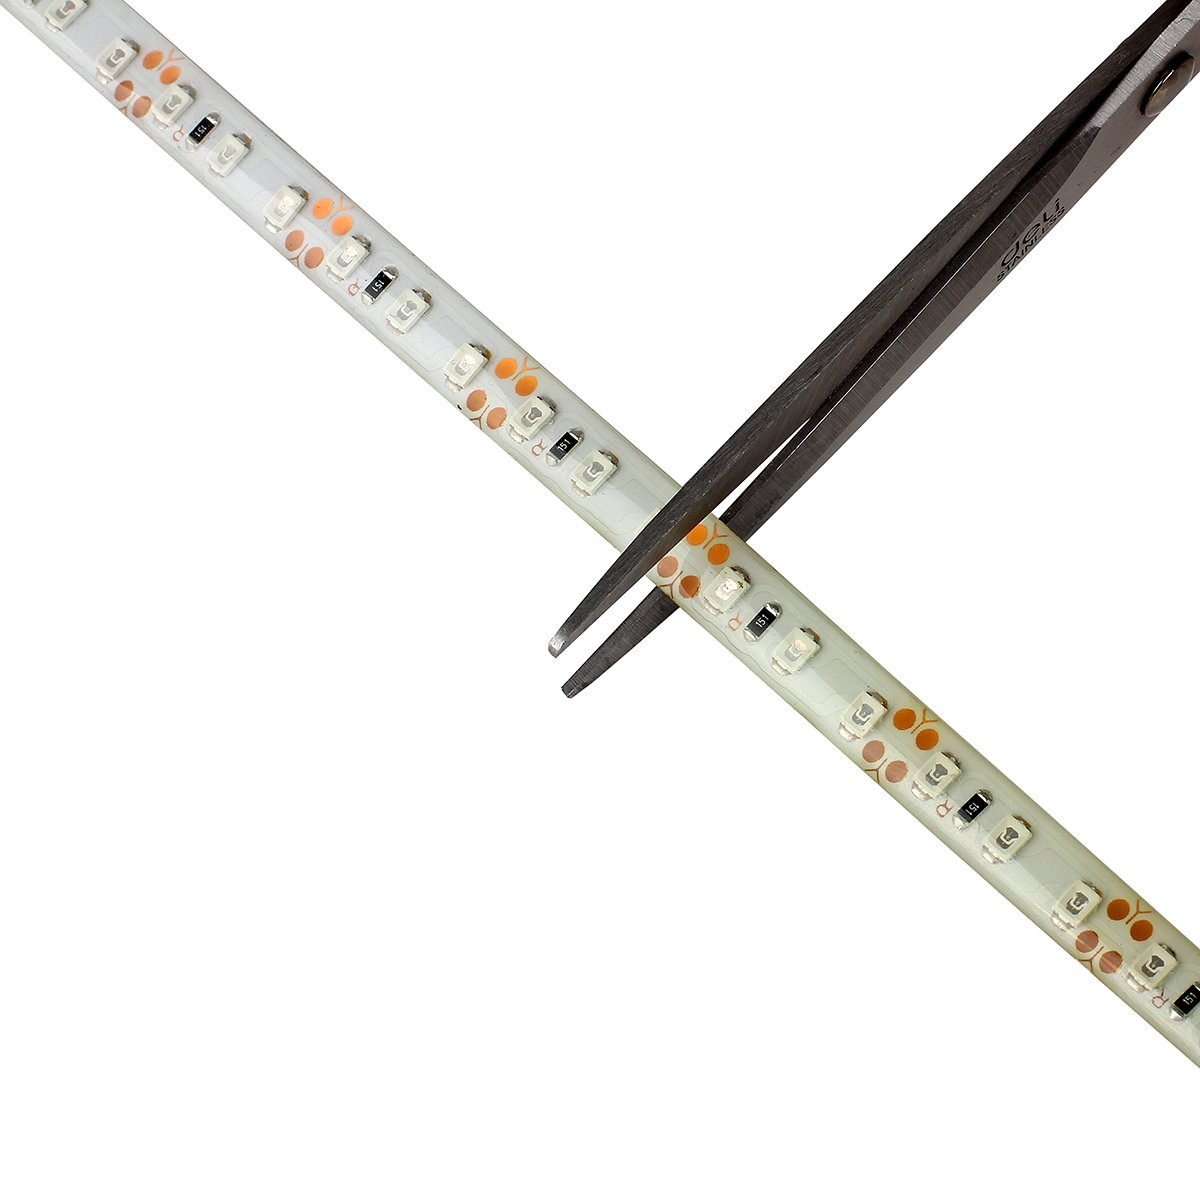 SUPERNIGHT High Density Green Waterproof Led Light Strip, SMD 3528, 5 Meter or 16 Ft LED Strip 120 Leds/M by SUPERNIGHT (Image #6)